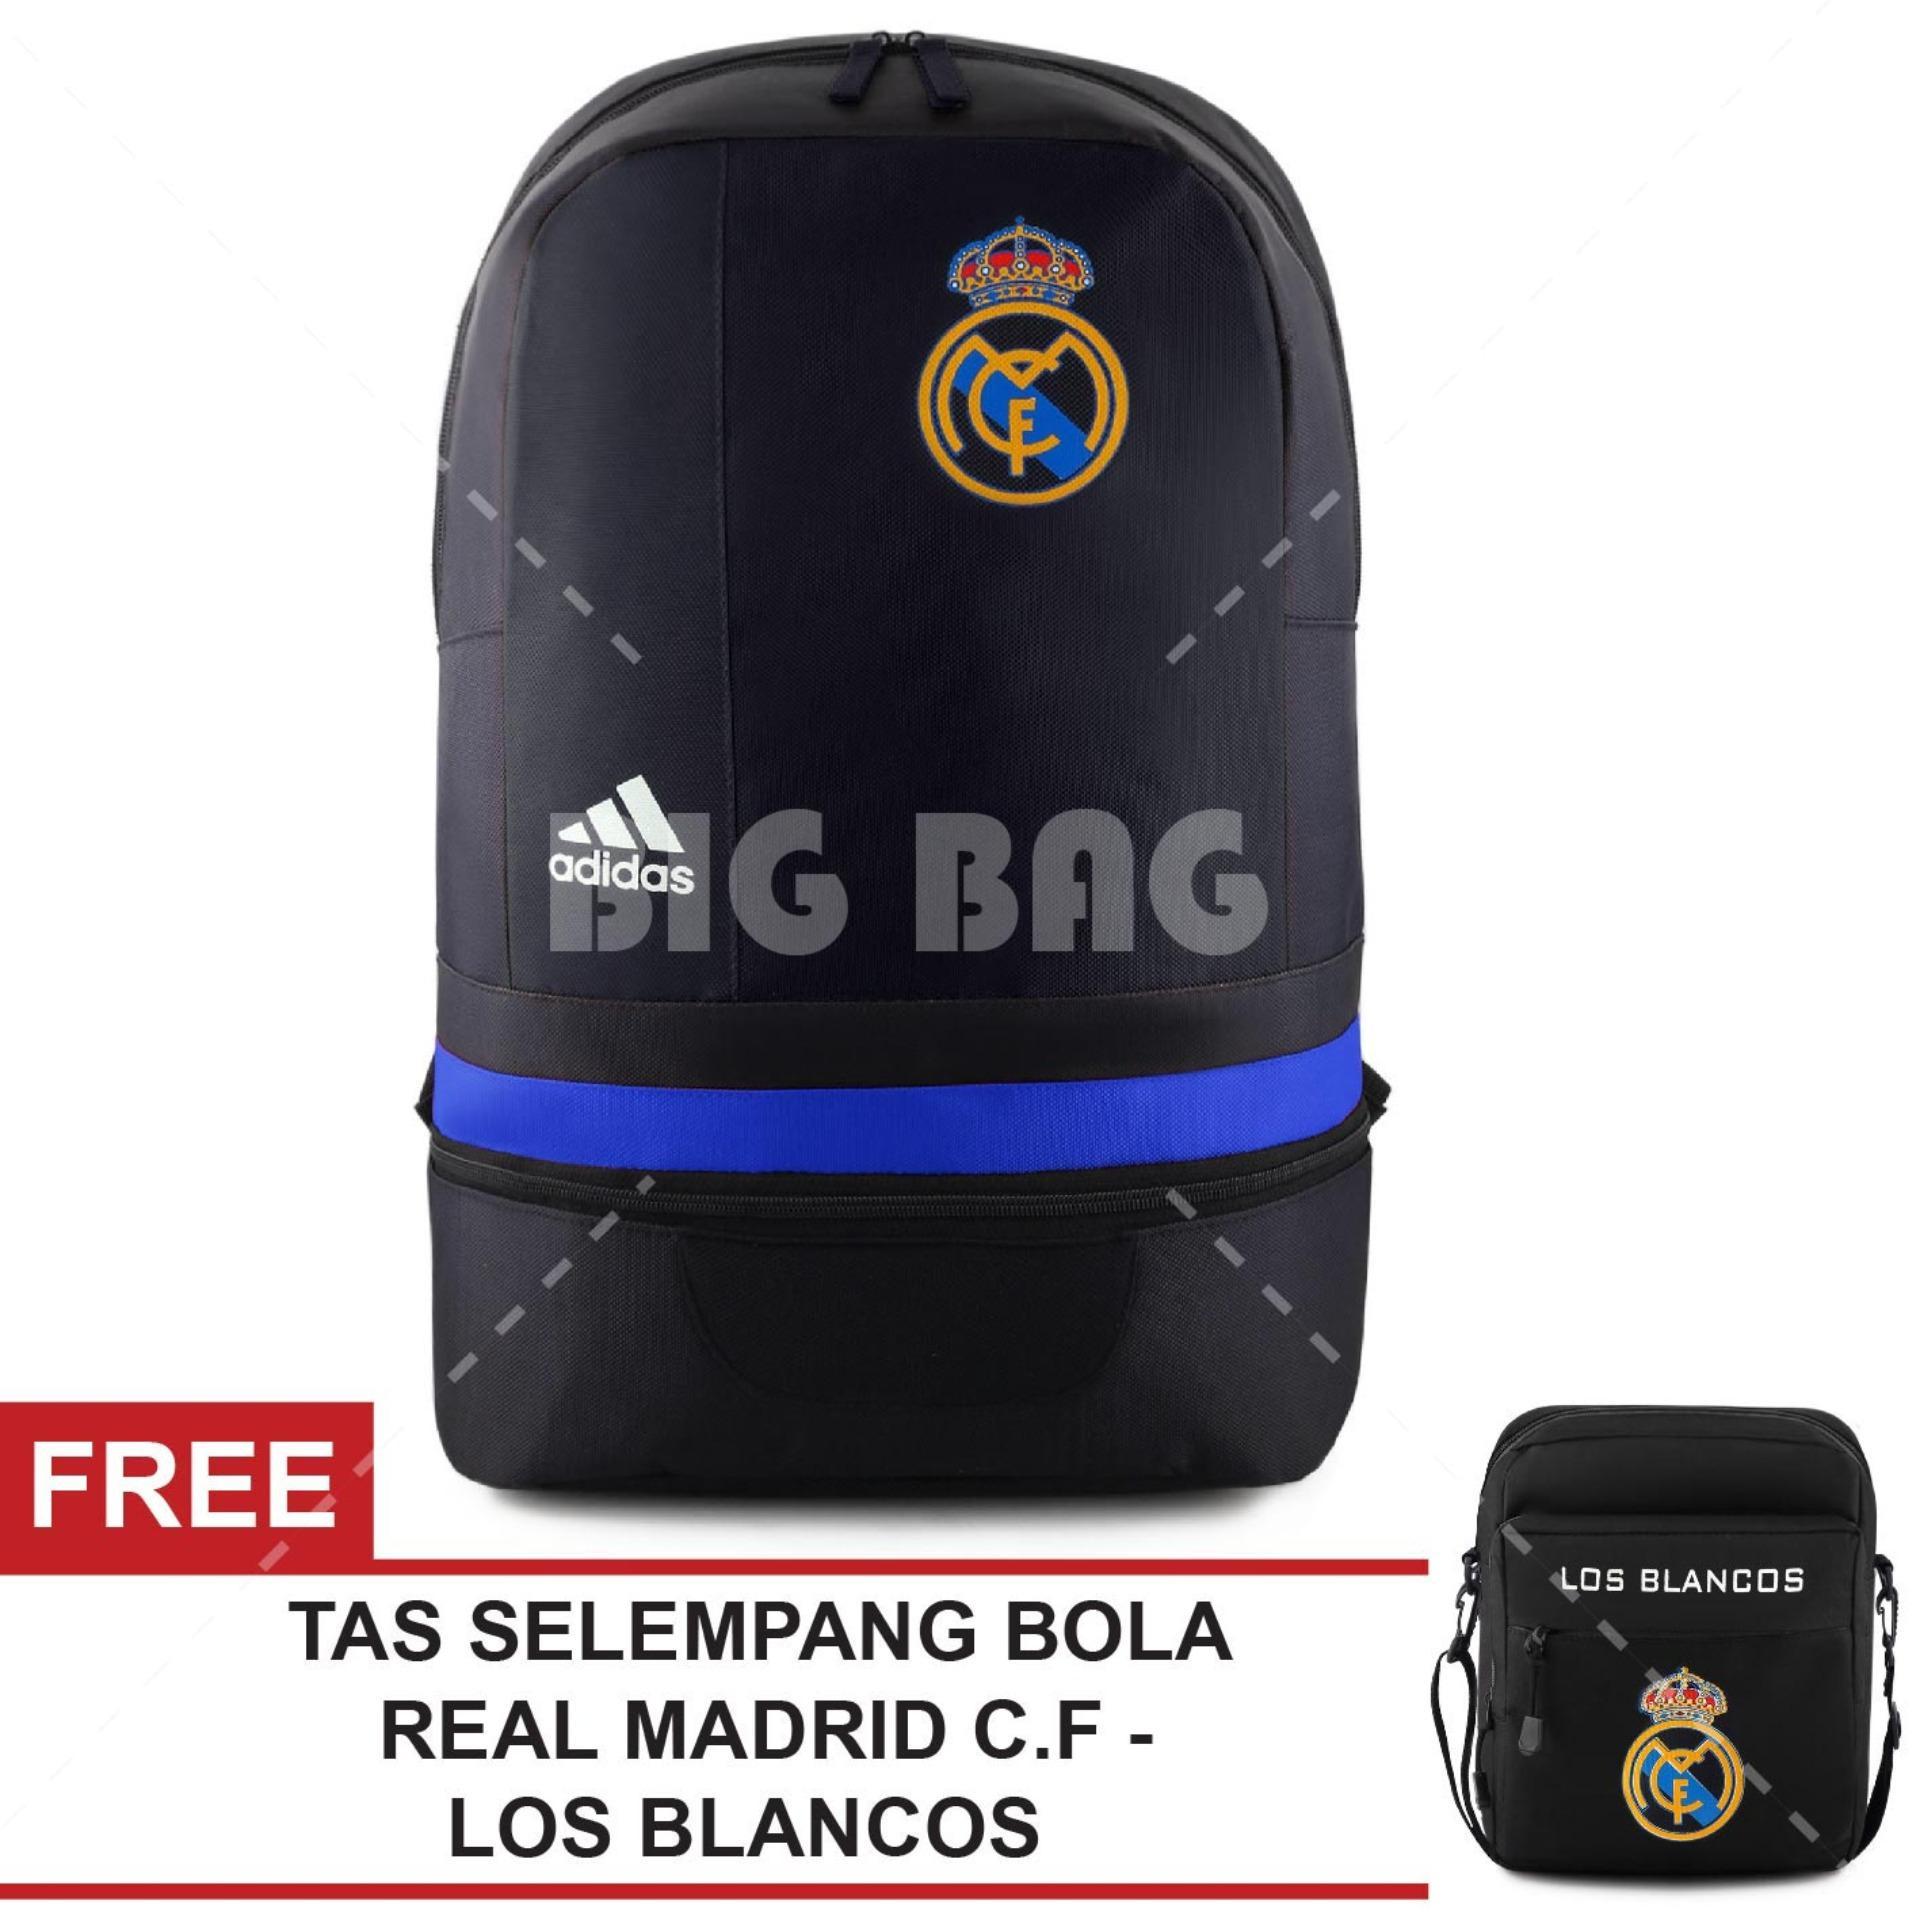 Tas Ransel Bola Pria Adidas Real Madrid C.F - Santiago Bernabeu Laptop Backpack Men Soccer Editions